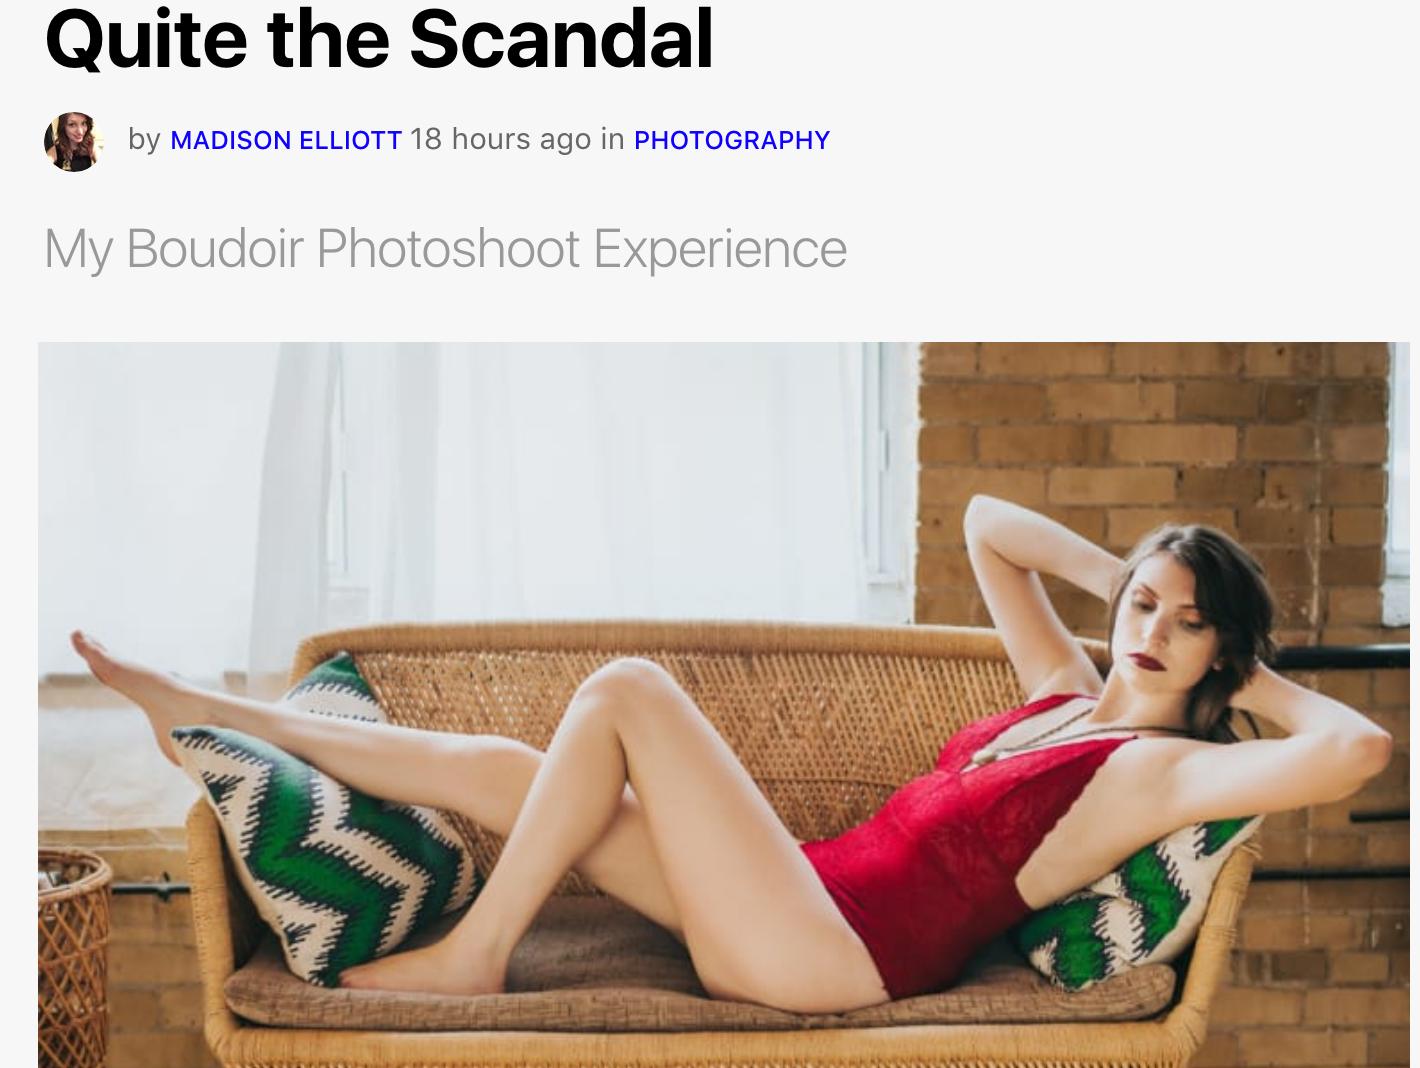 madison-elliott-scandaleuse-photography-viva-media